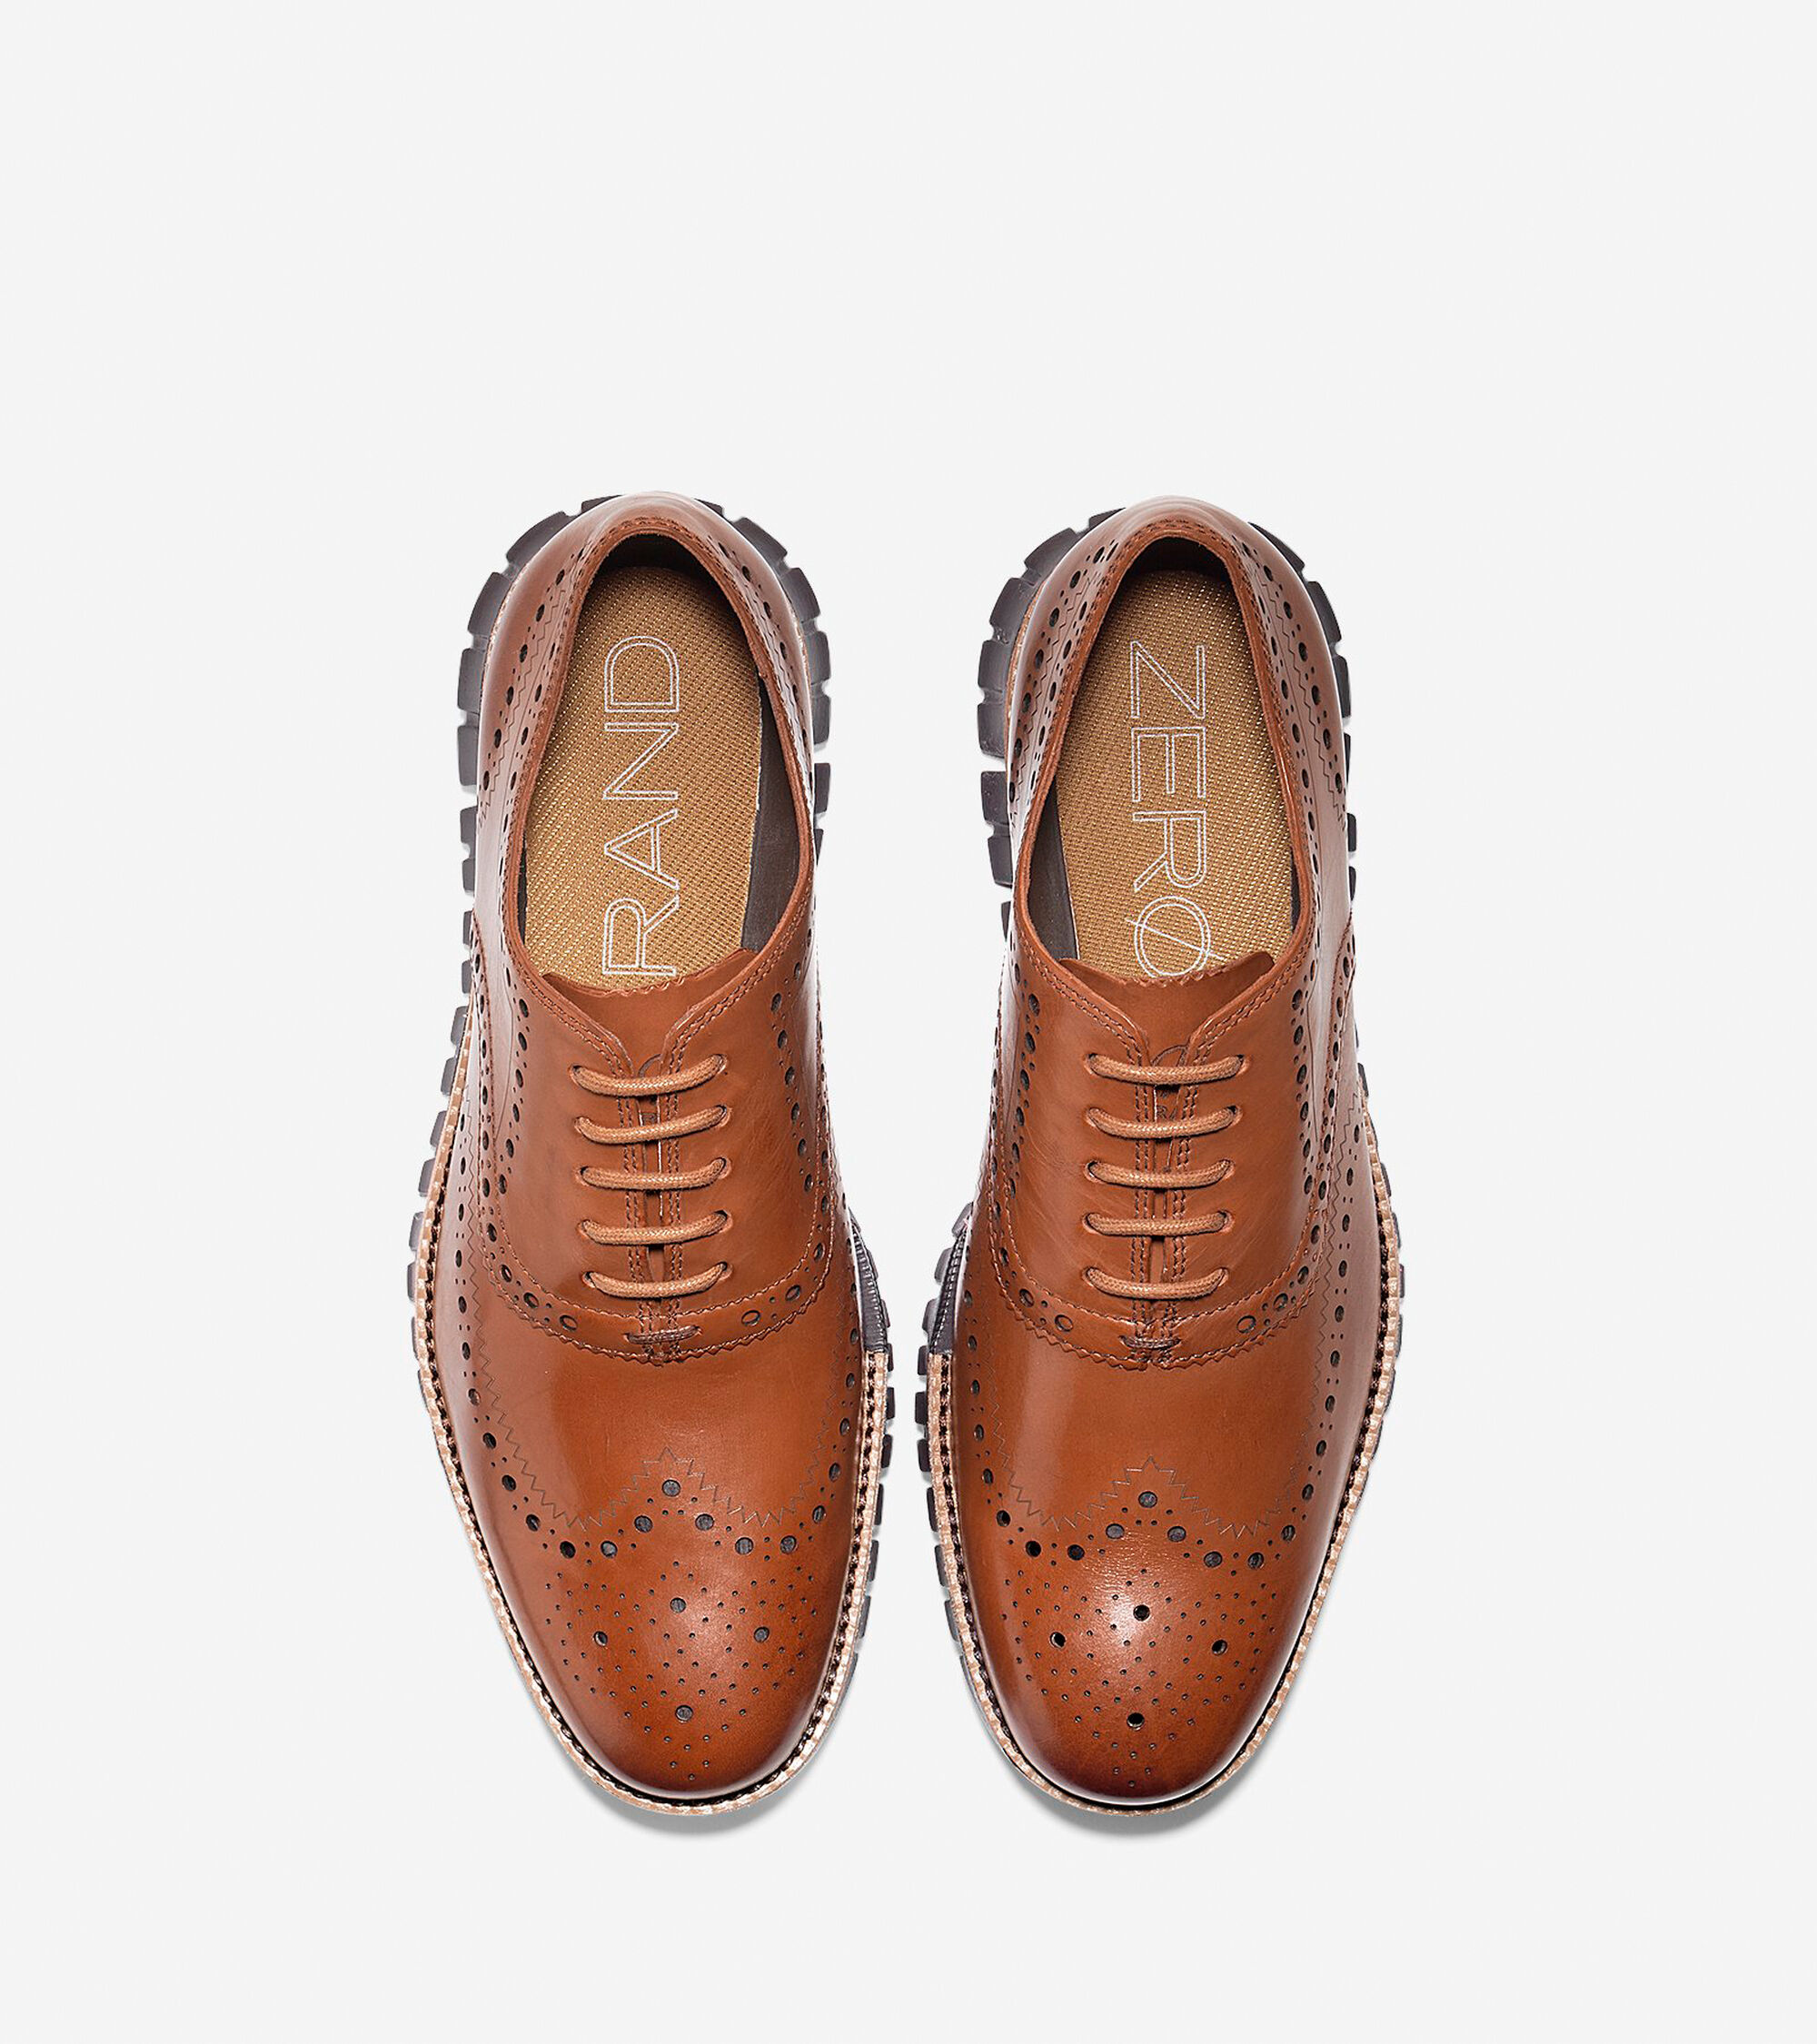 Zerogrand Wingtip Oxfords In British Tan Java Cole Haan D Island Shoes Slip On Comfort Leather Dark Brown Mens Zergrand Oxford